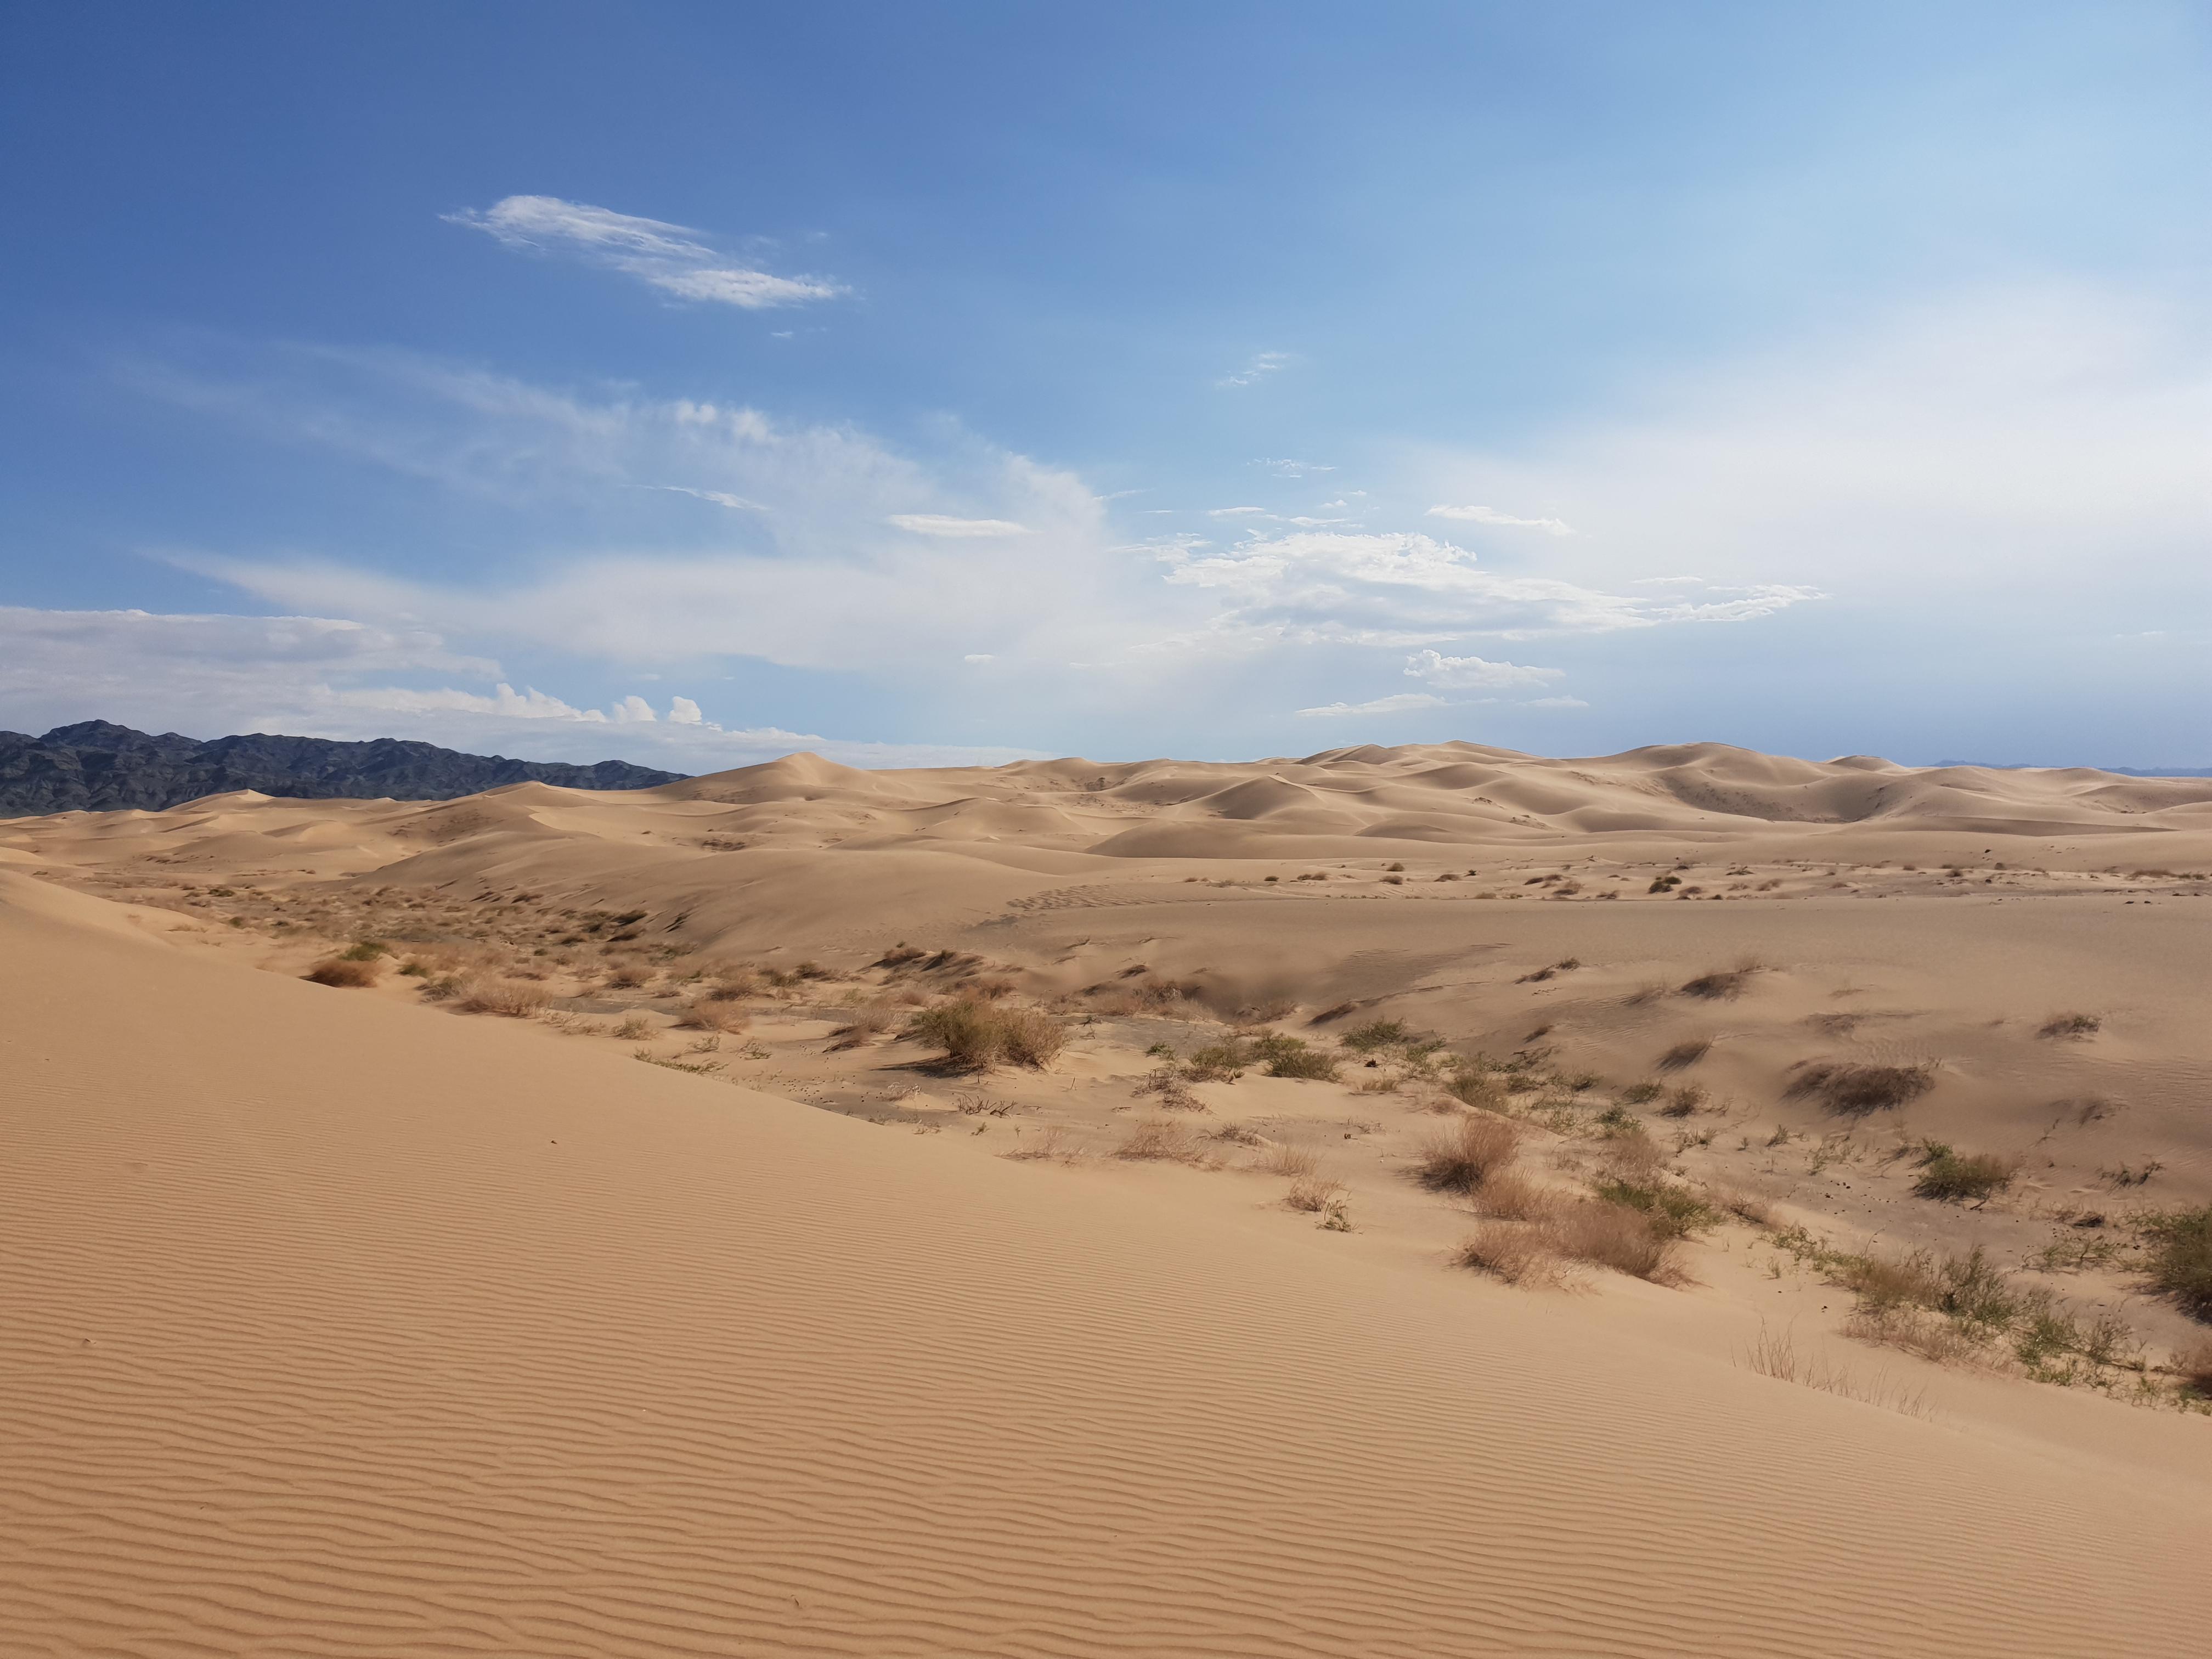 Hot ass mongolian women Gobi Desert Wikipedia